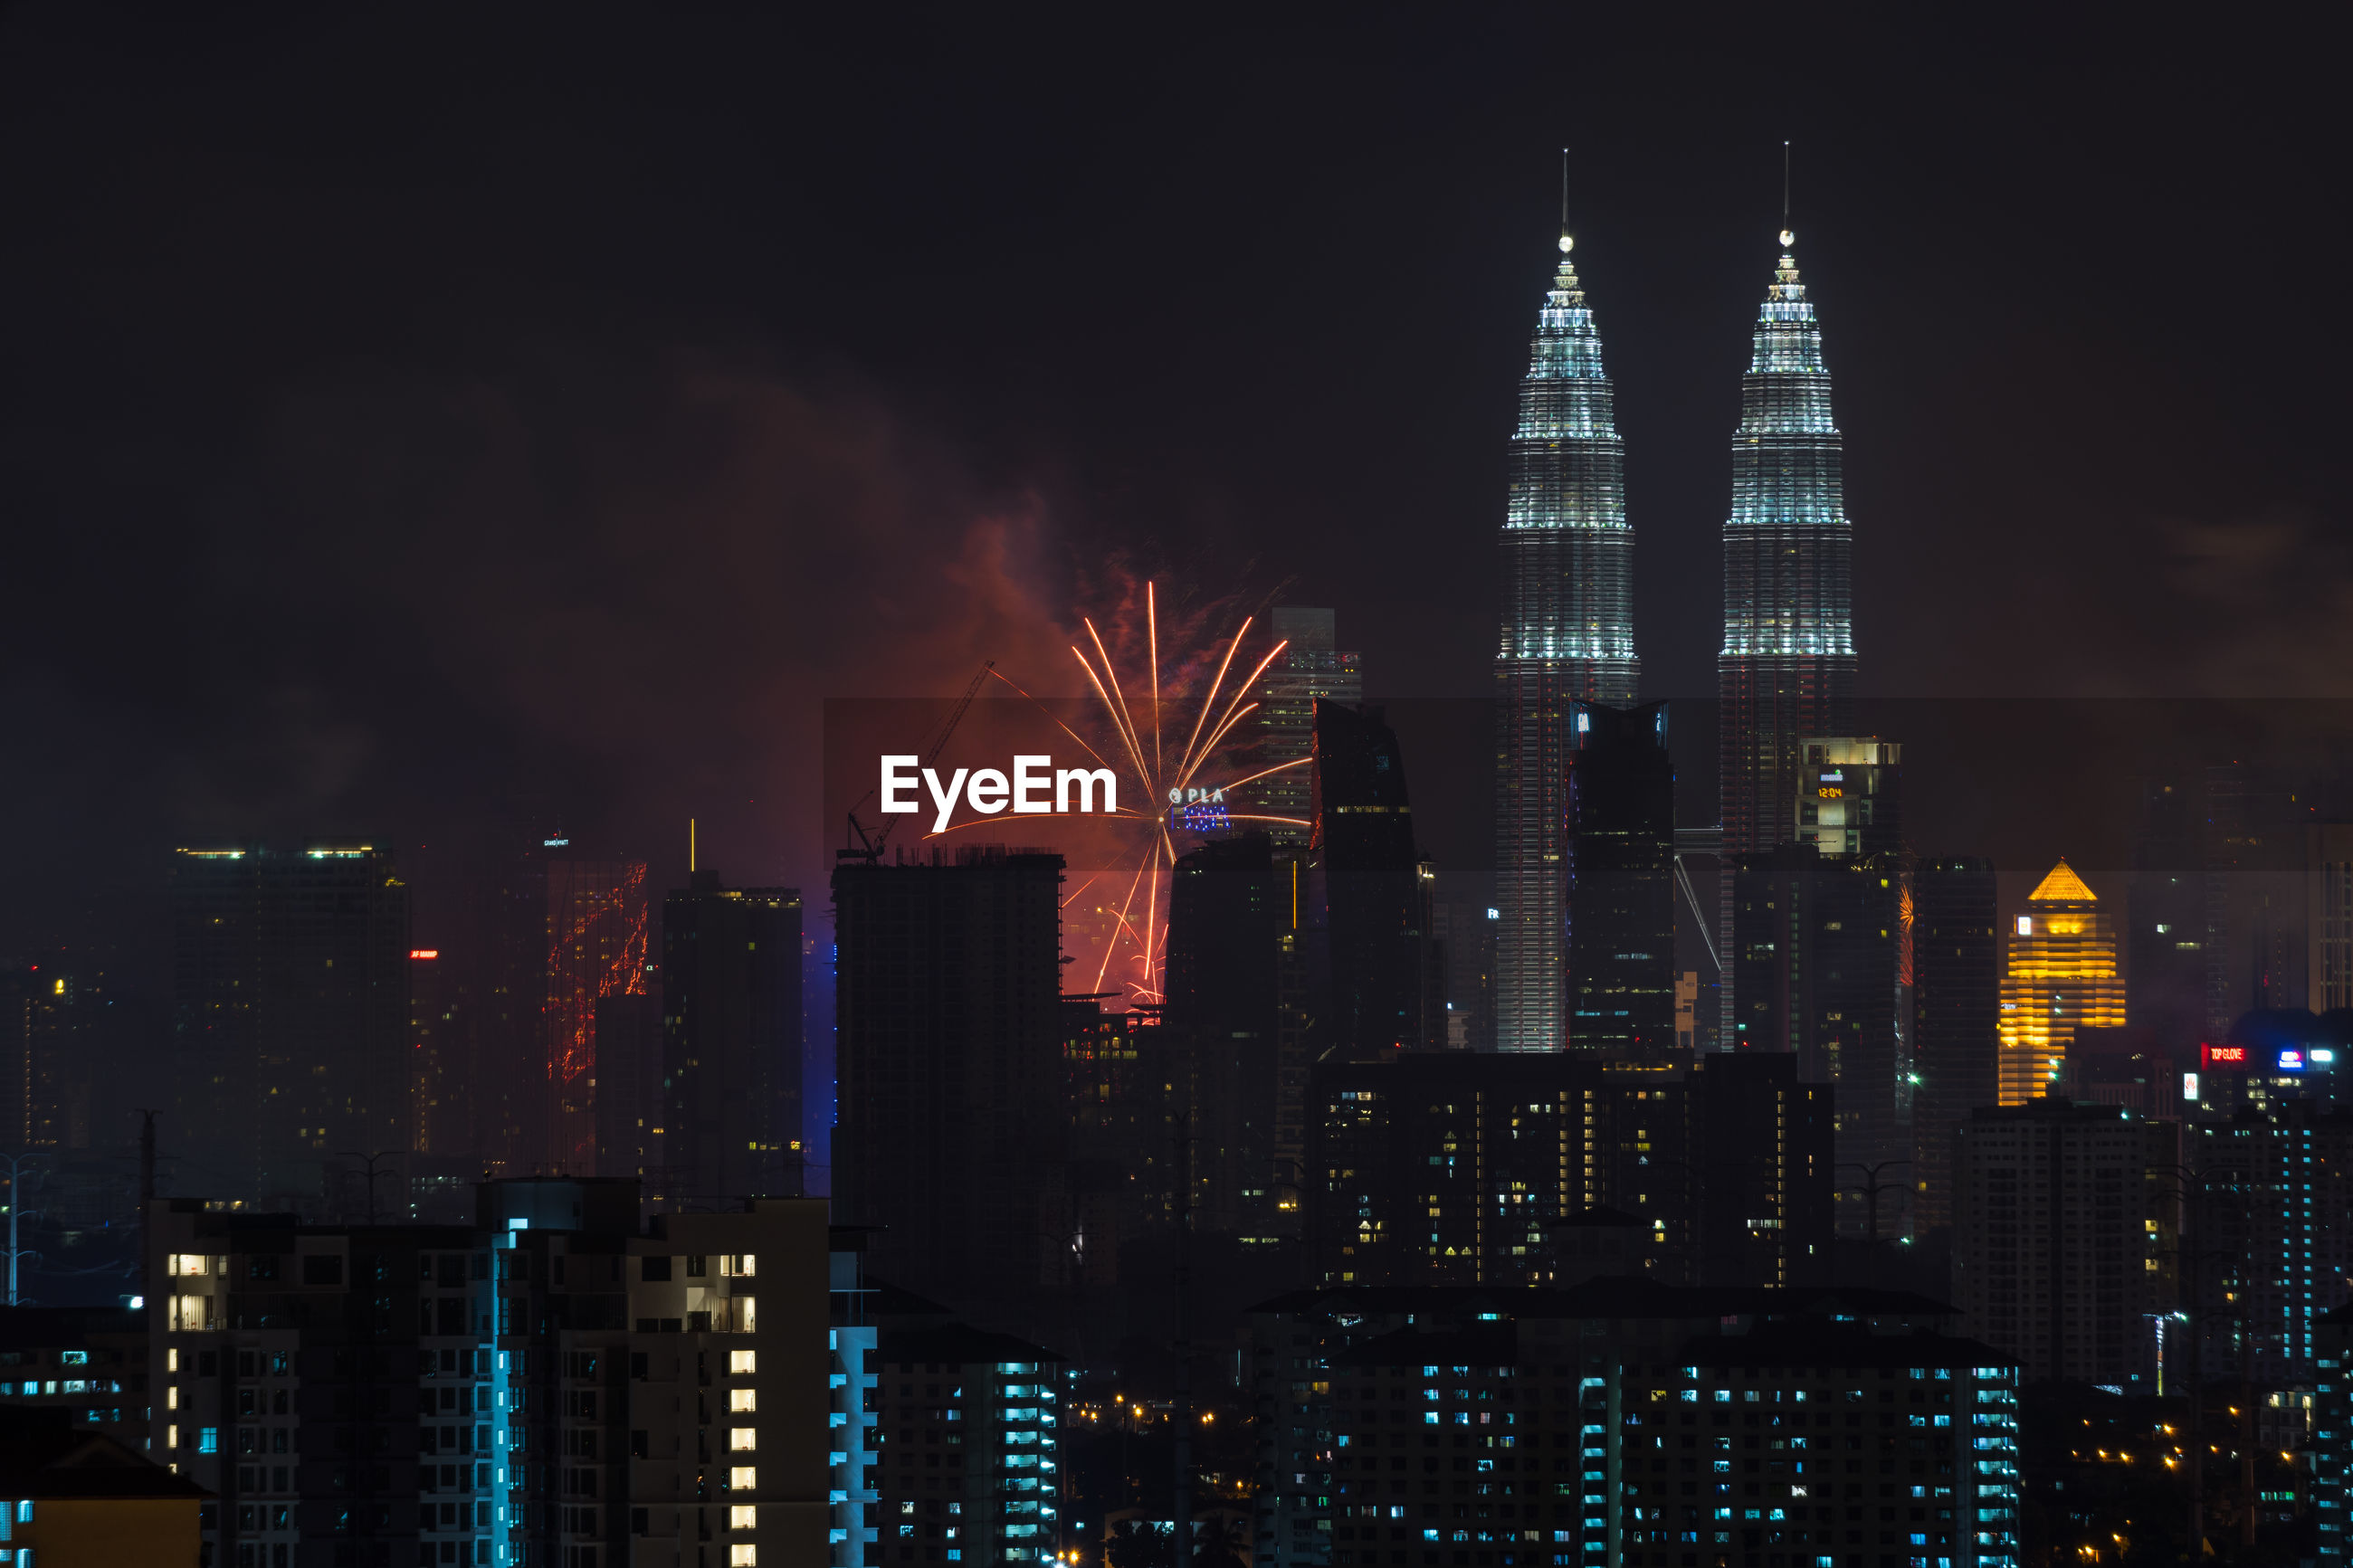 Illuminated petronas towers and fireworks at night